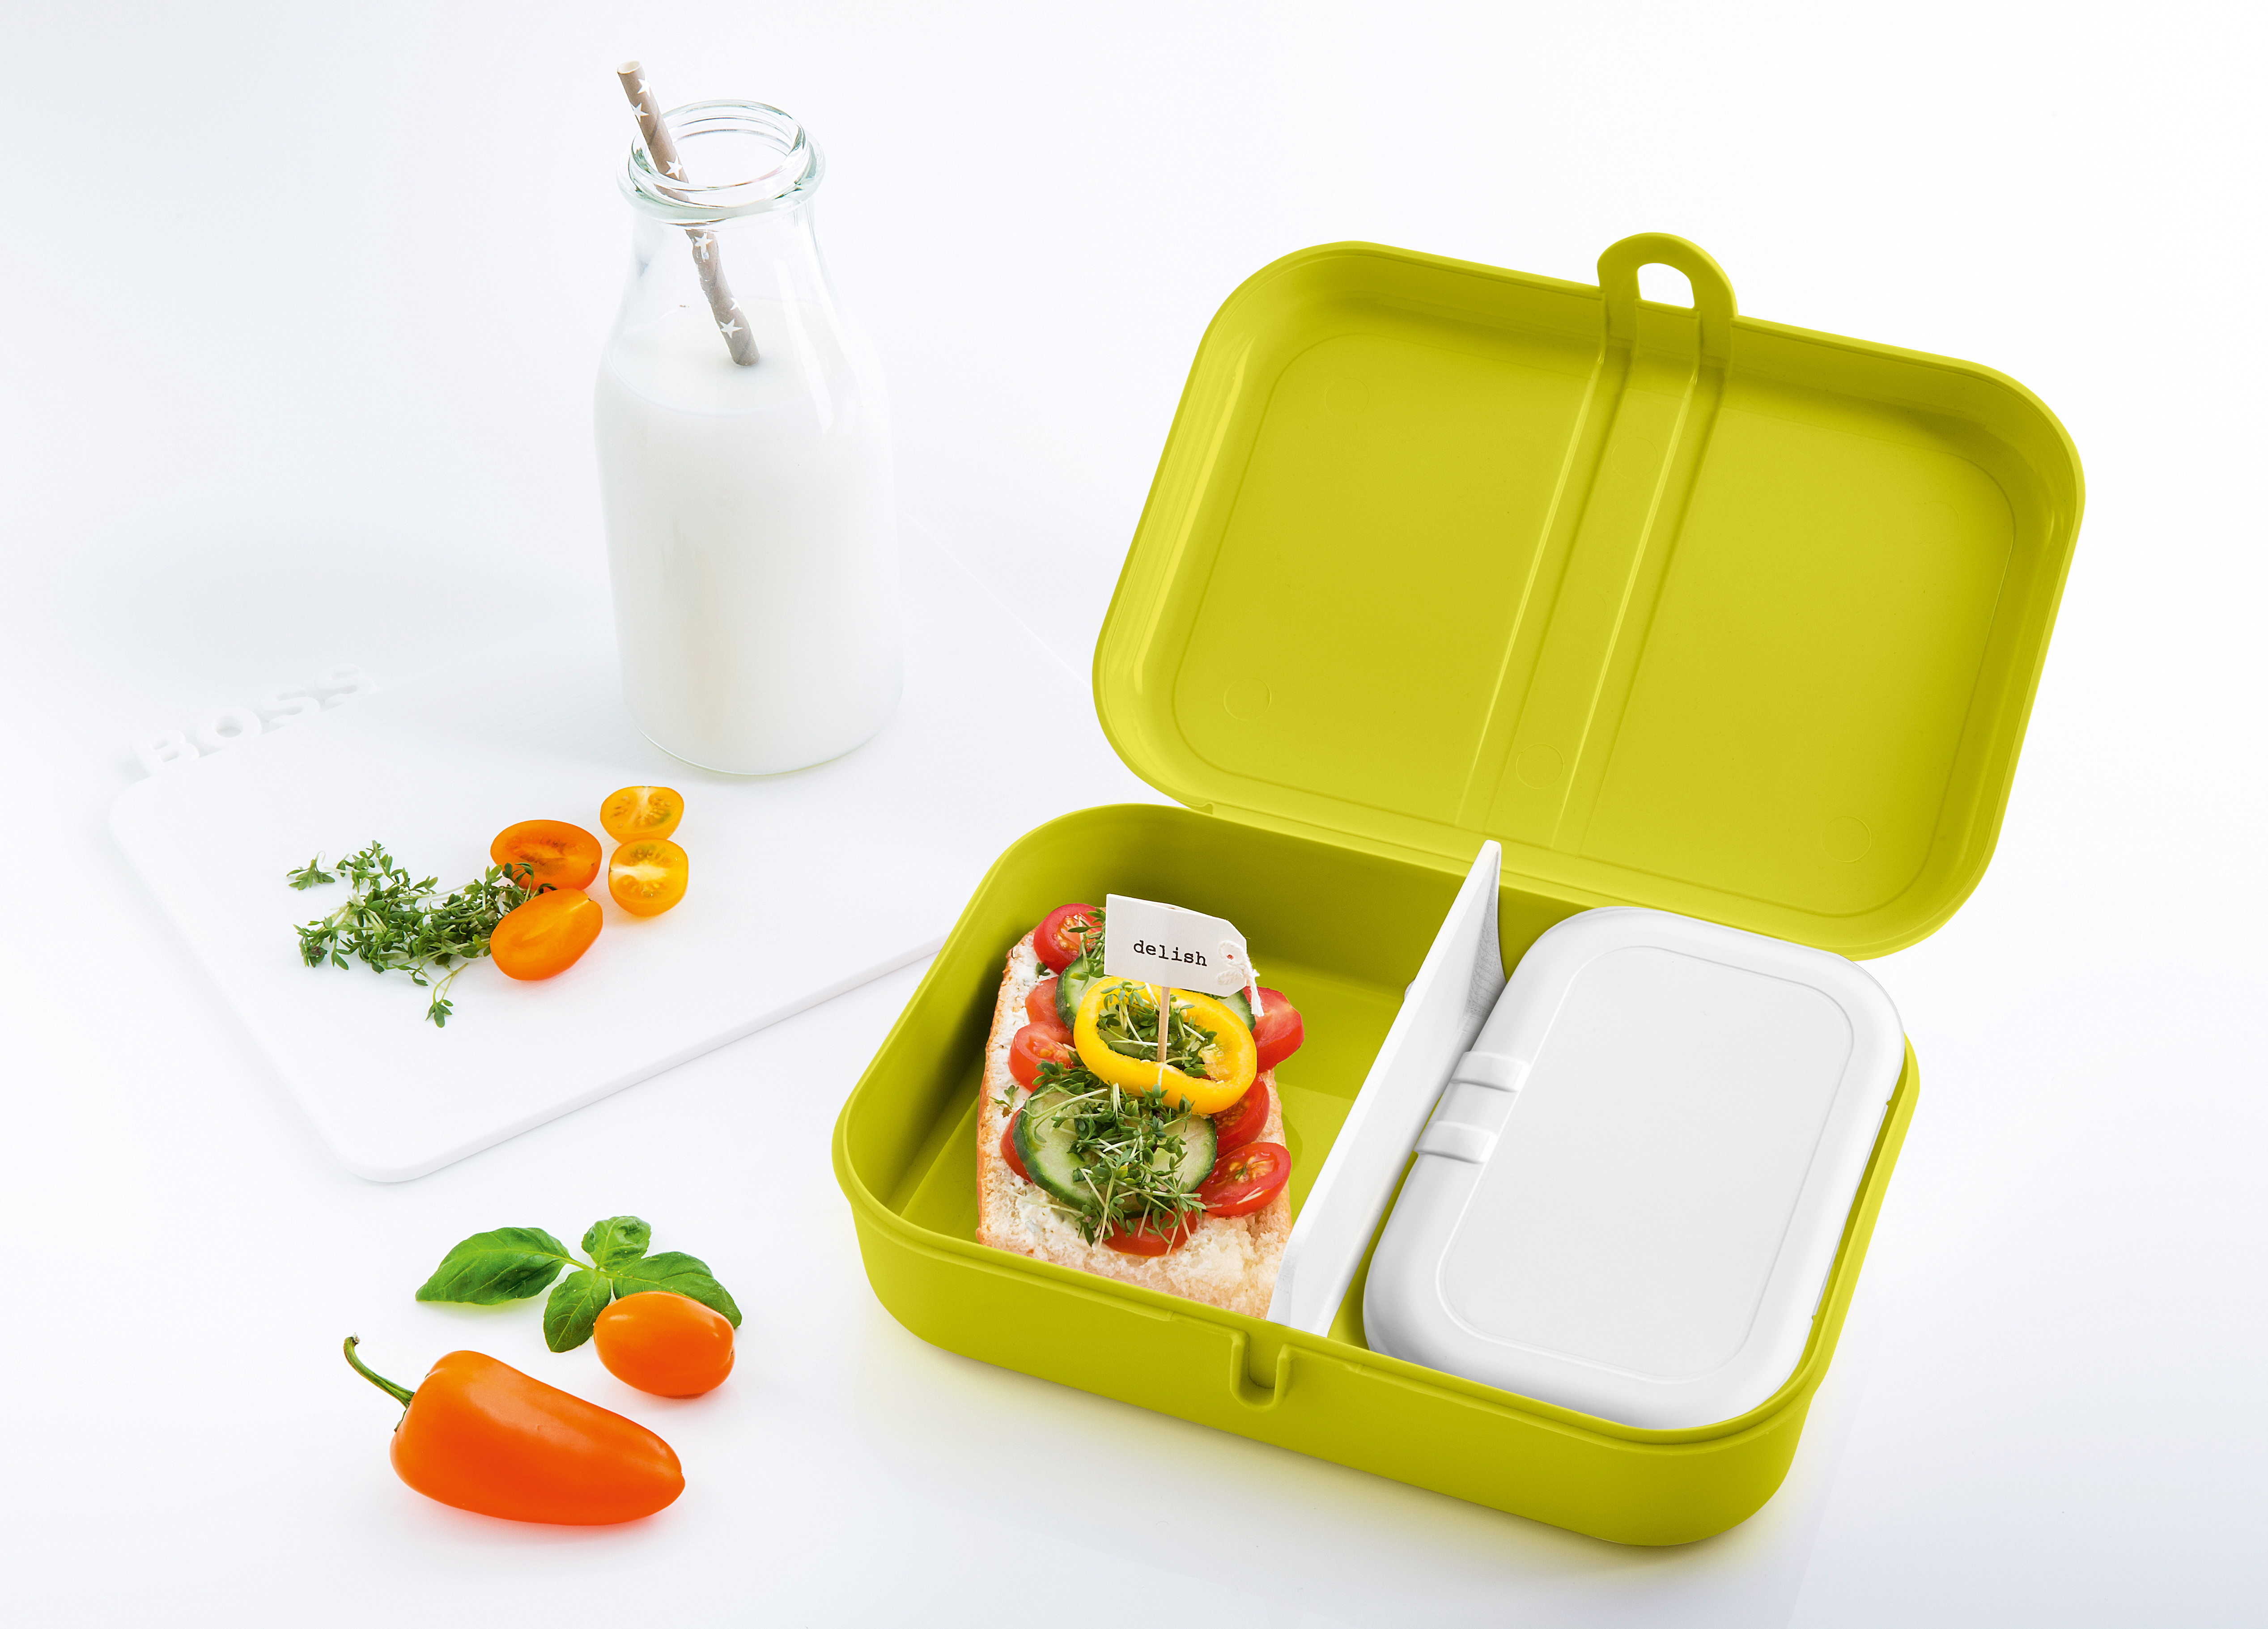 PASCAL   Trennsteg für Lunchbox - Pantone-Farbe: white